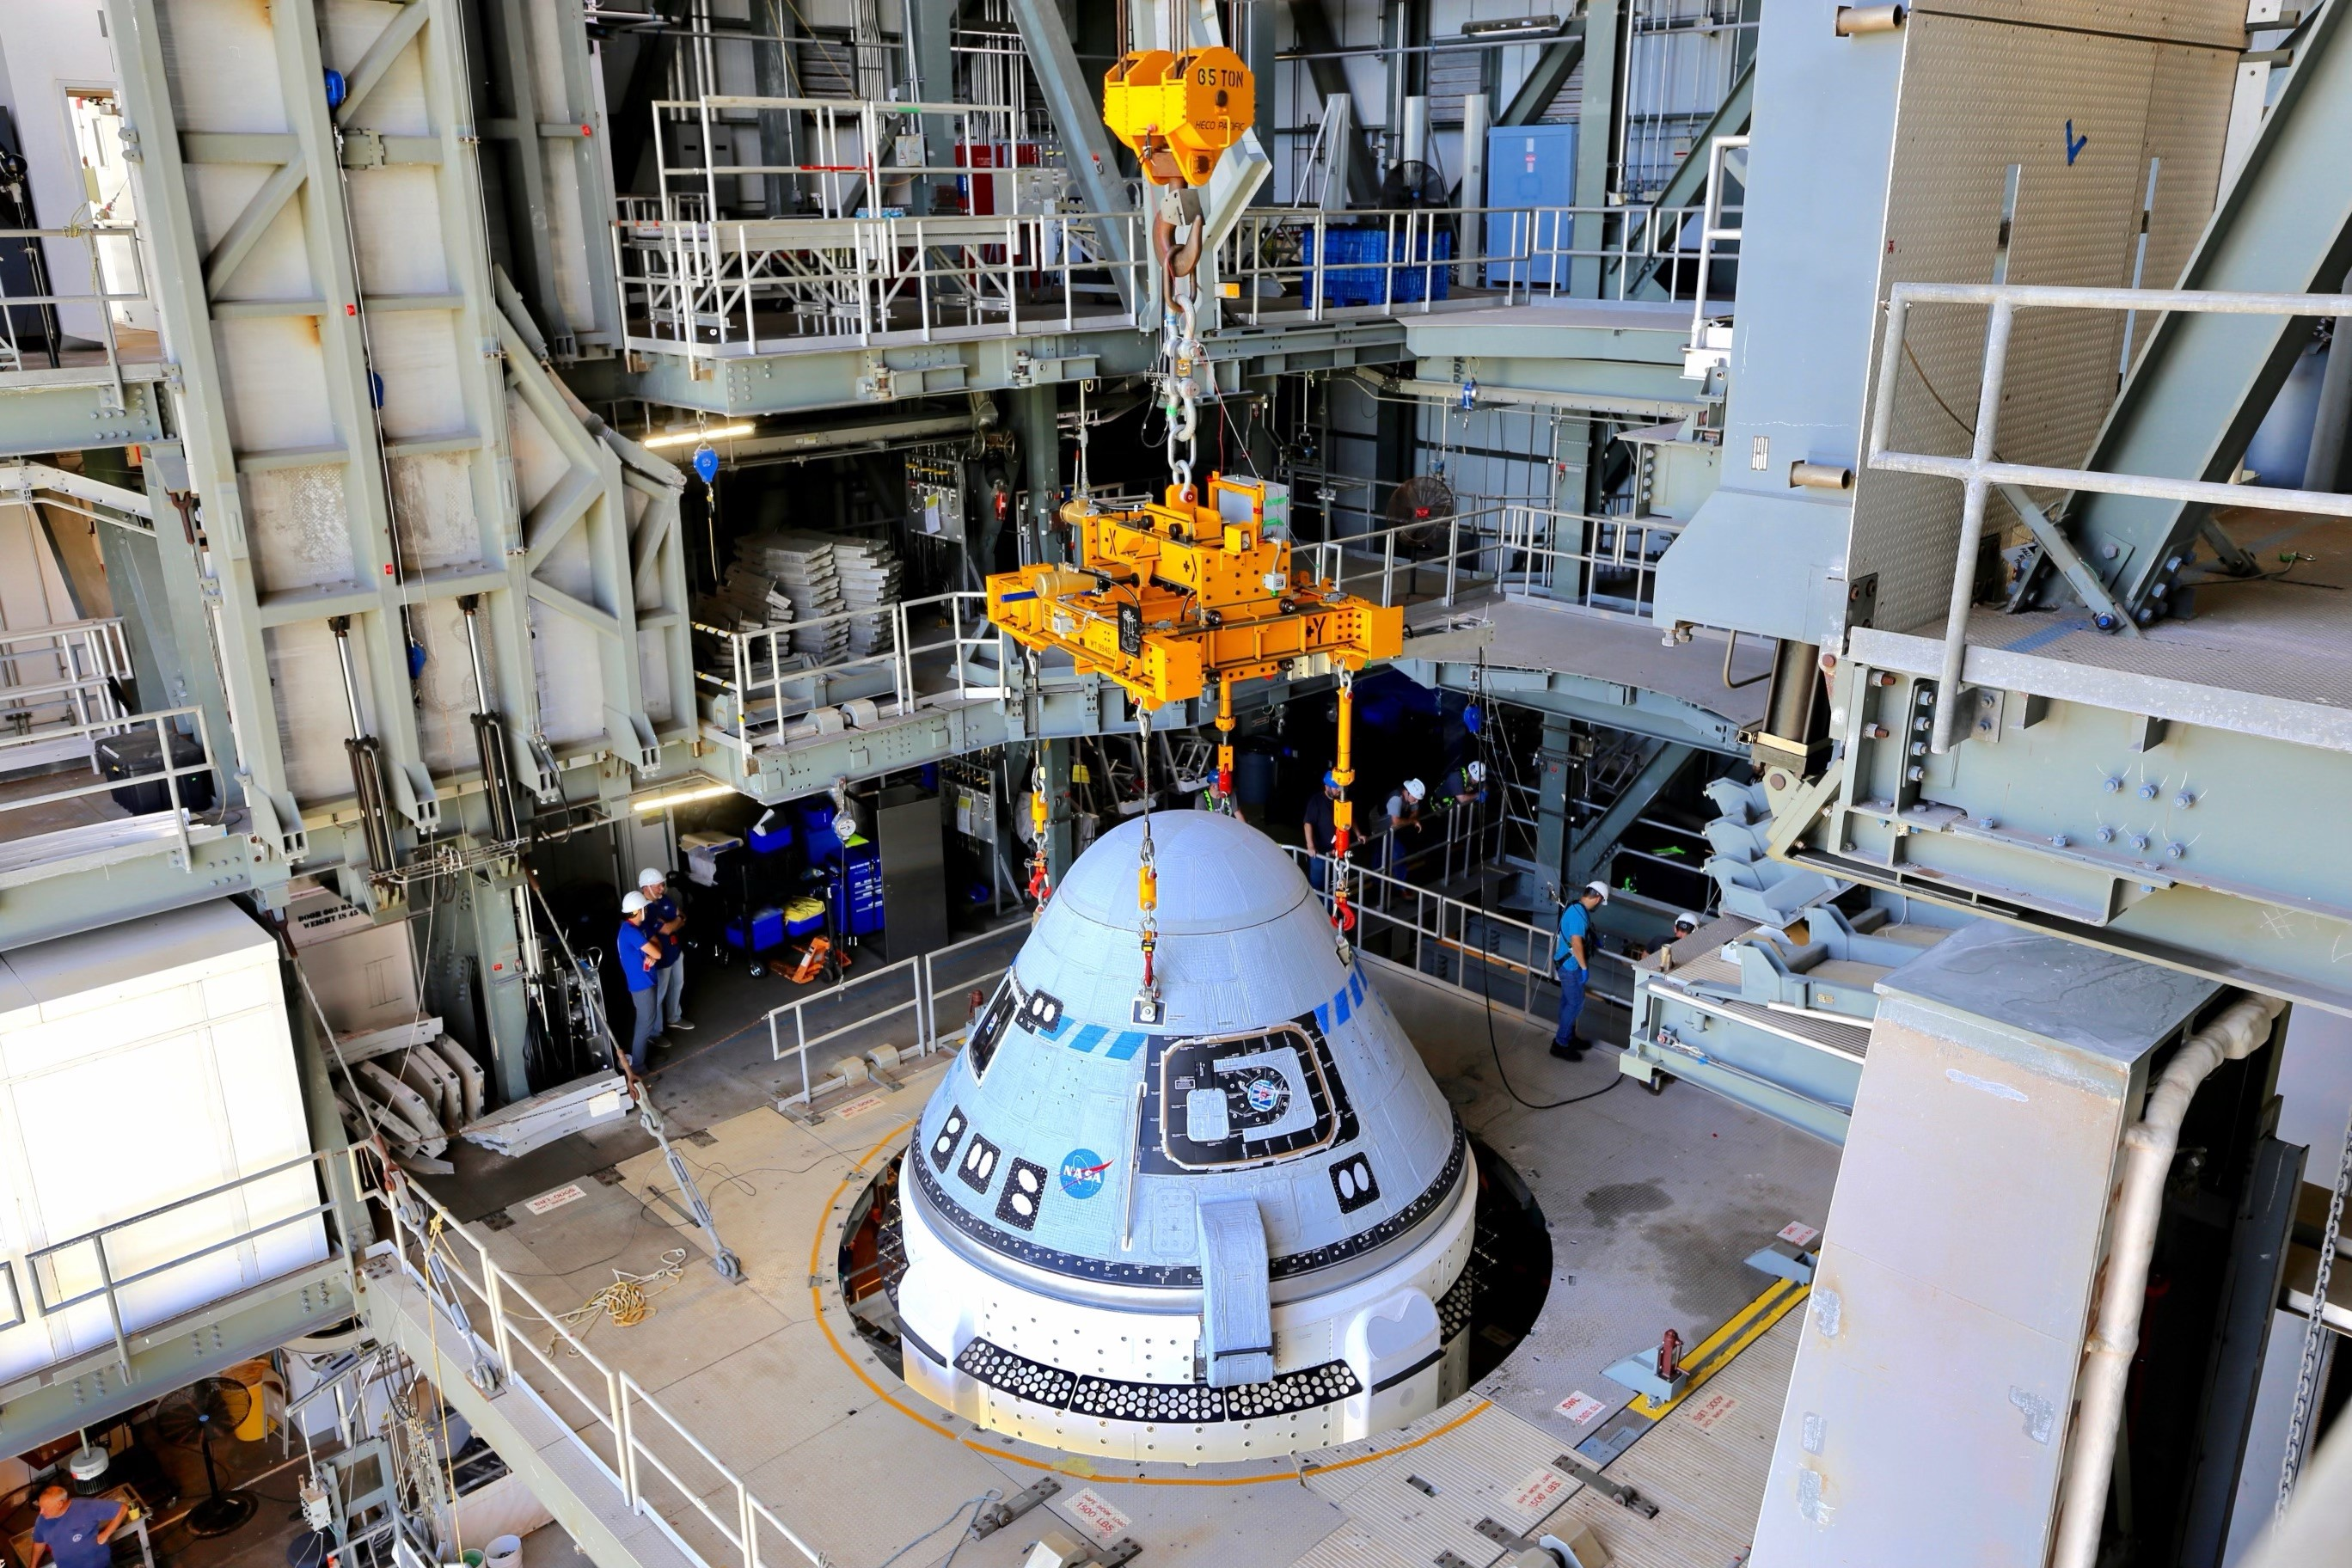 Boeing's CST-100 Starliner Secured Atop an Atlas V Rocket